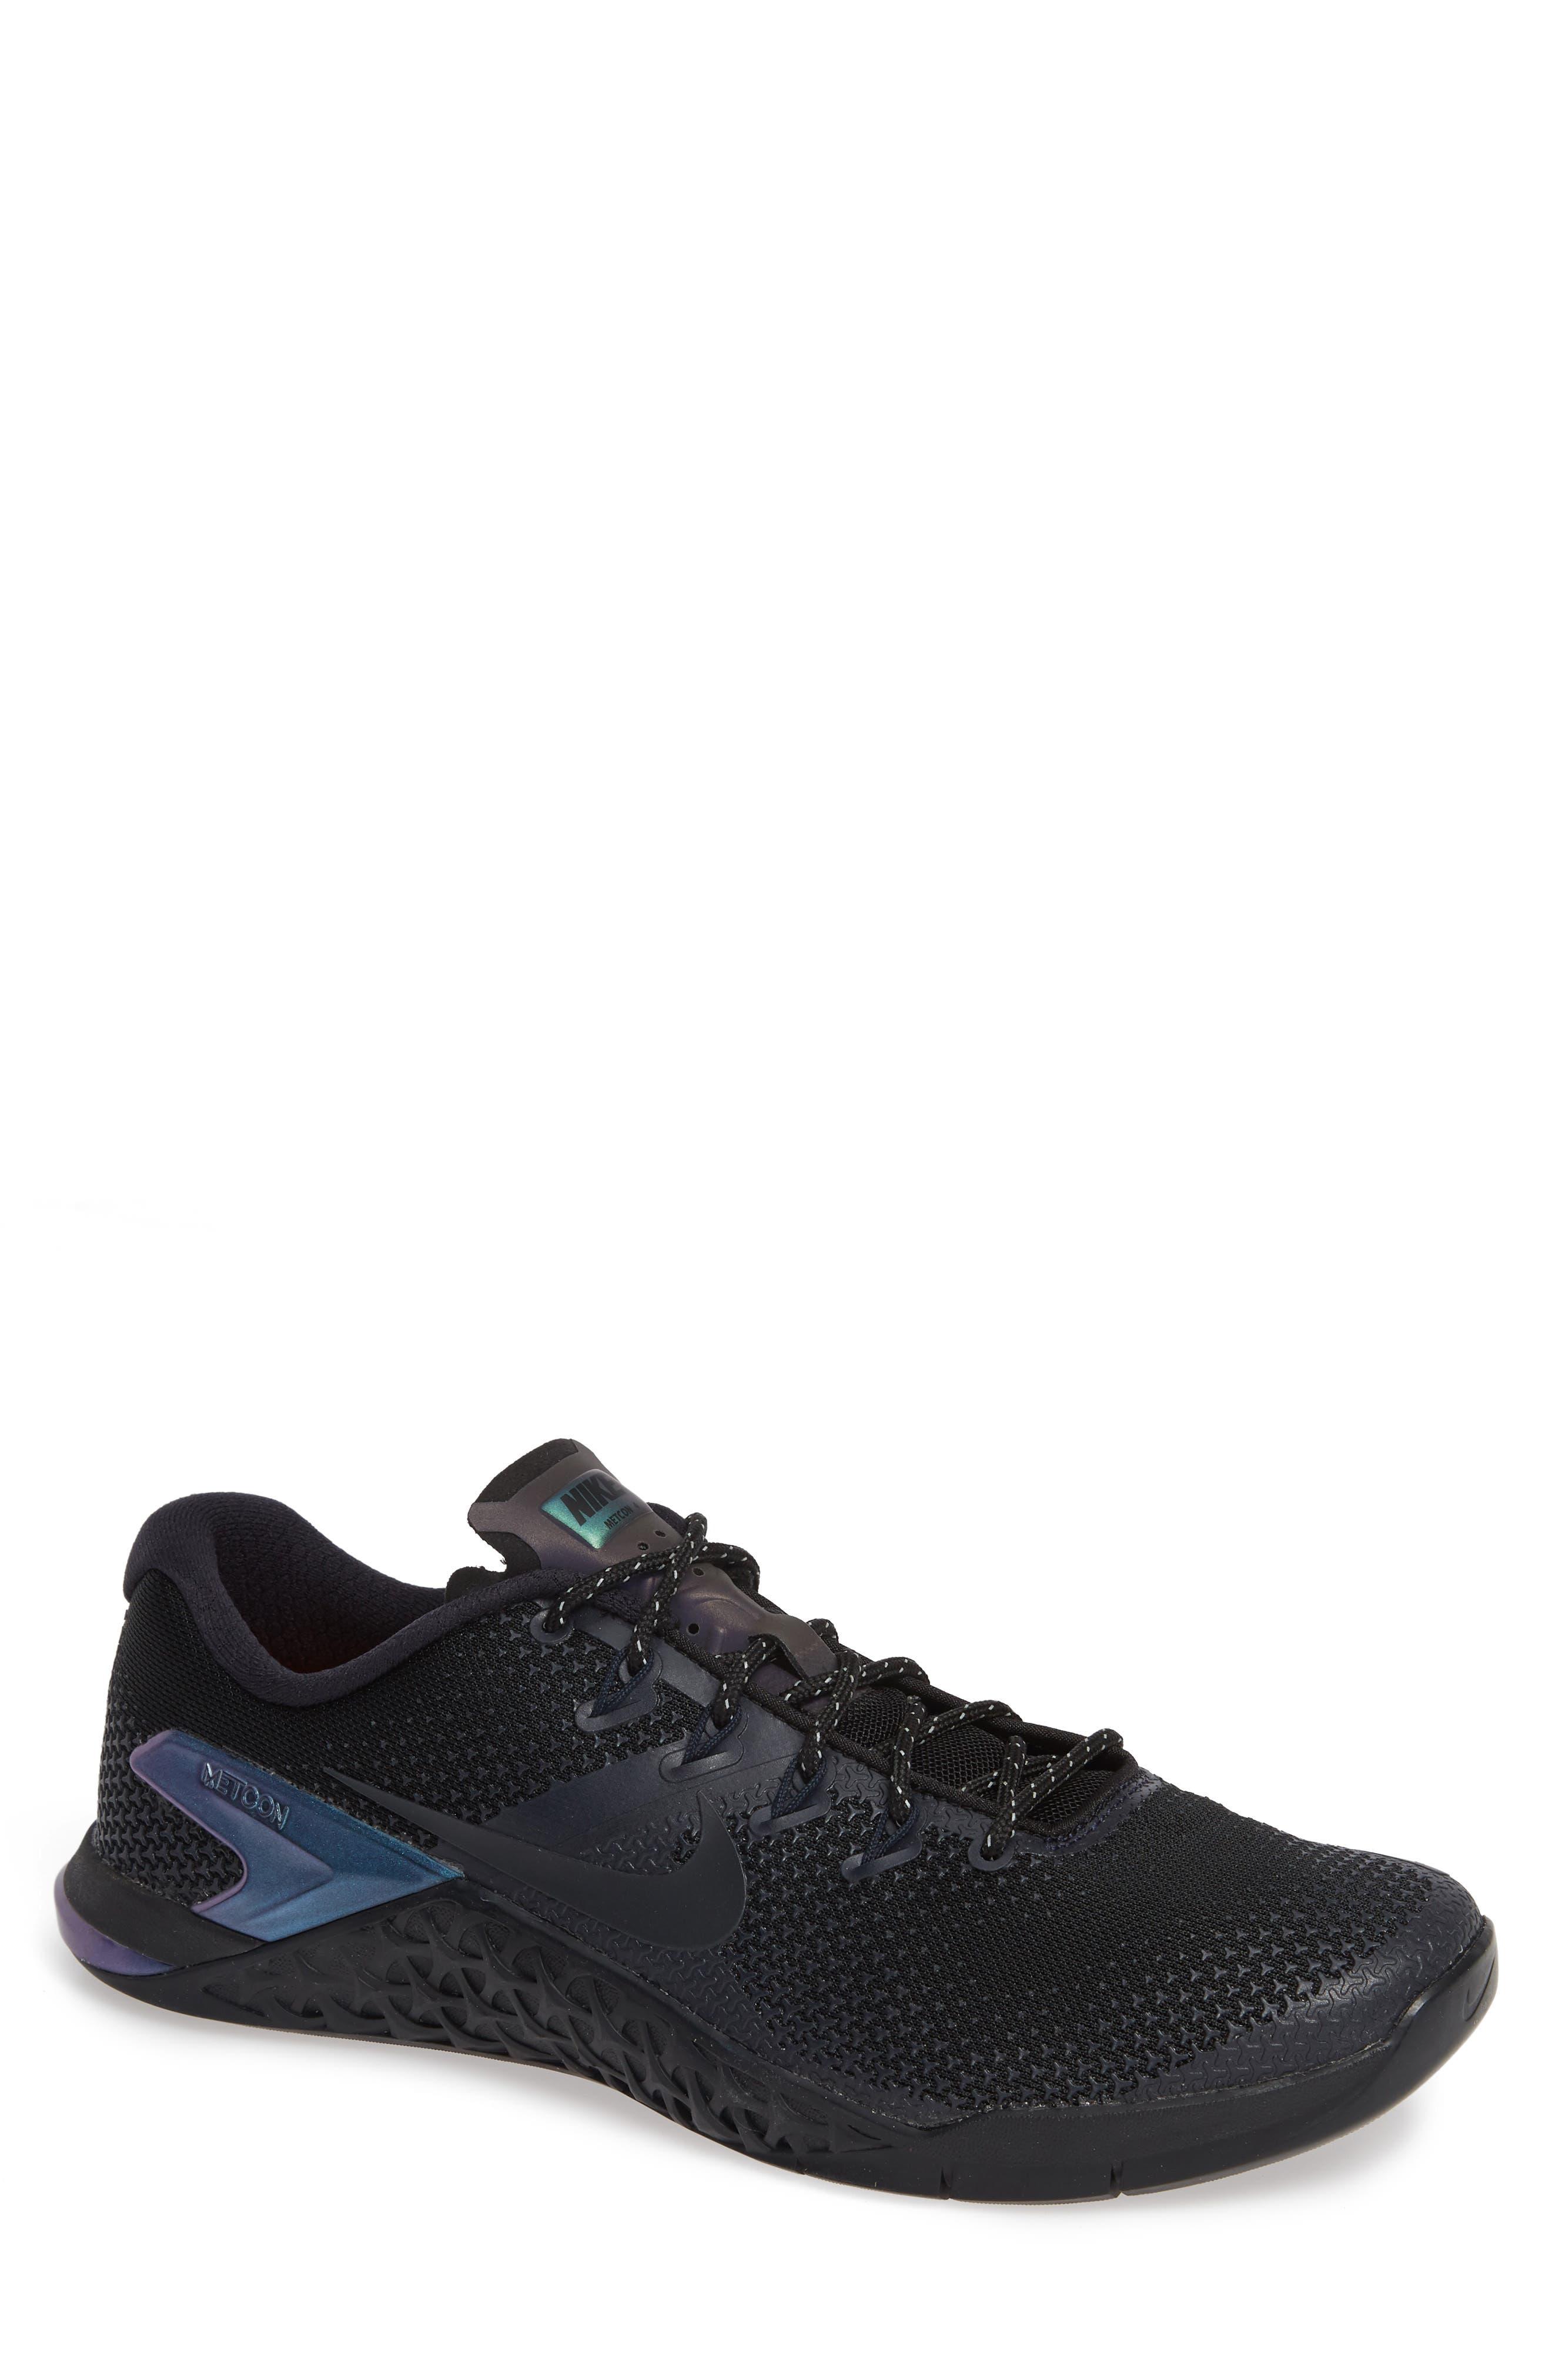 NIKE,                             Metcon 4 Prem Training Shoe,                             Main thumbnail 1, color,                             BLACK/ BLACK/ DARK OBSIDIAN